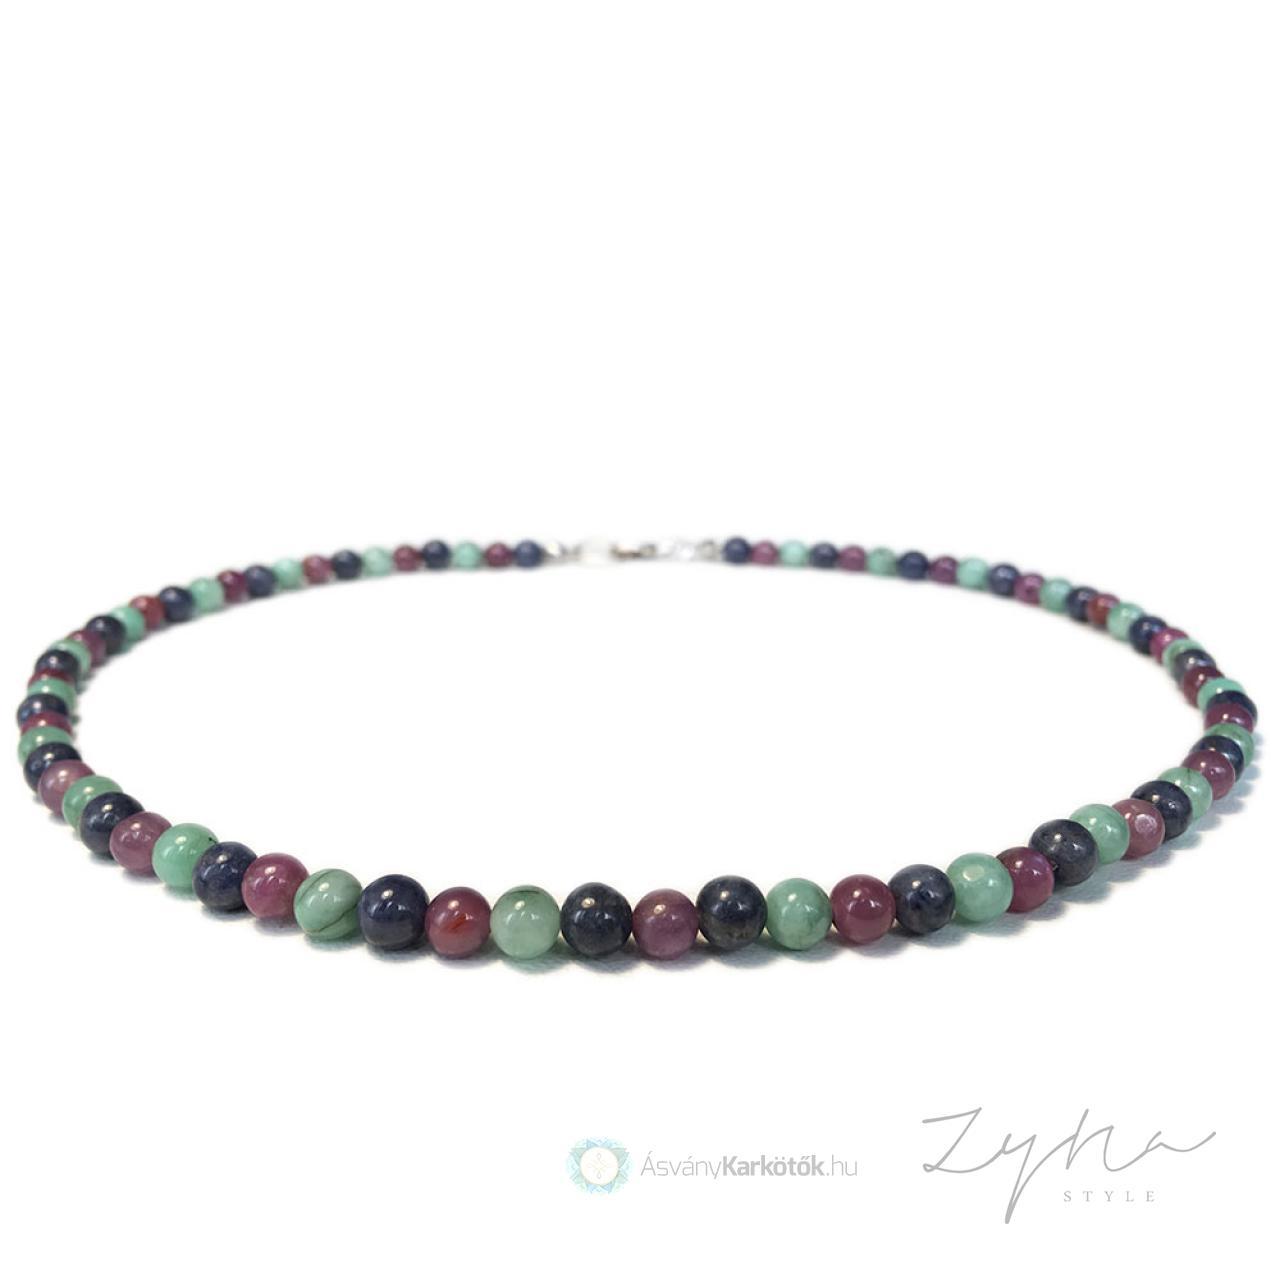 c81e06469 Drágakő nyaklánc smaragddal